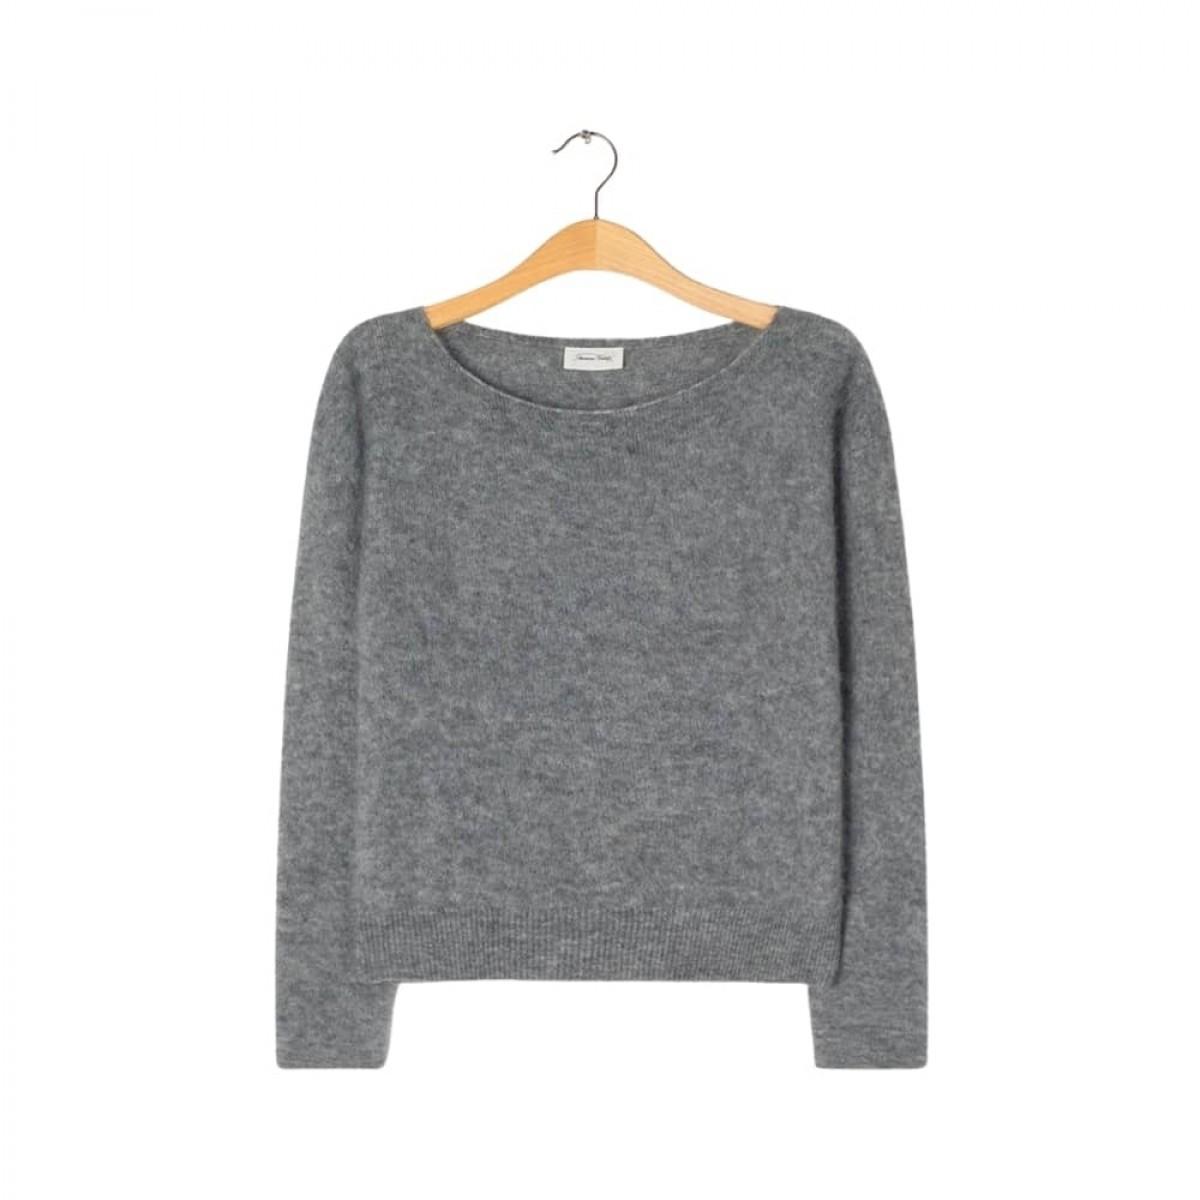 zabidoo strik - heather grey